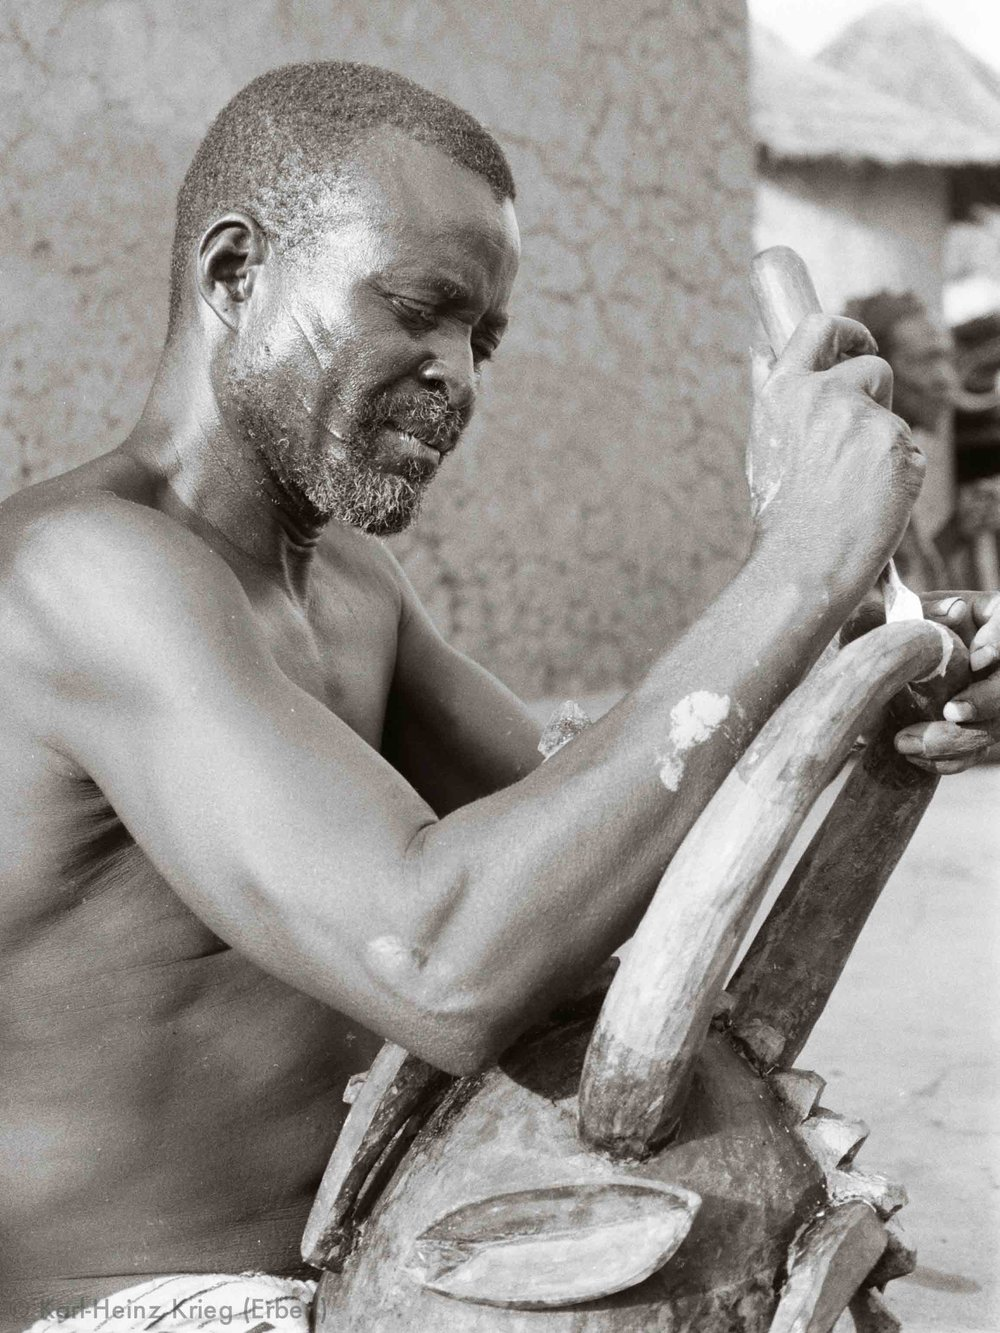 Karna Ouattara carving a helmet mask in his workplace. Photo: Karl-Heinz Krieg, Nafoun (Region of Boundiali, Côte d'Ivoire), 1975